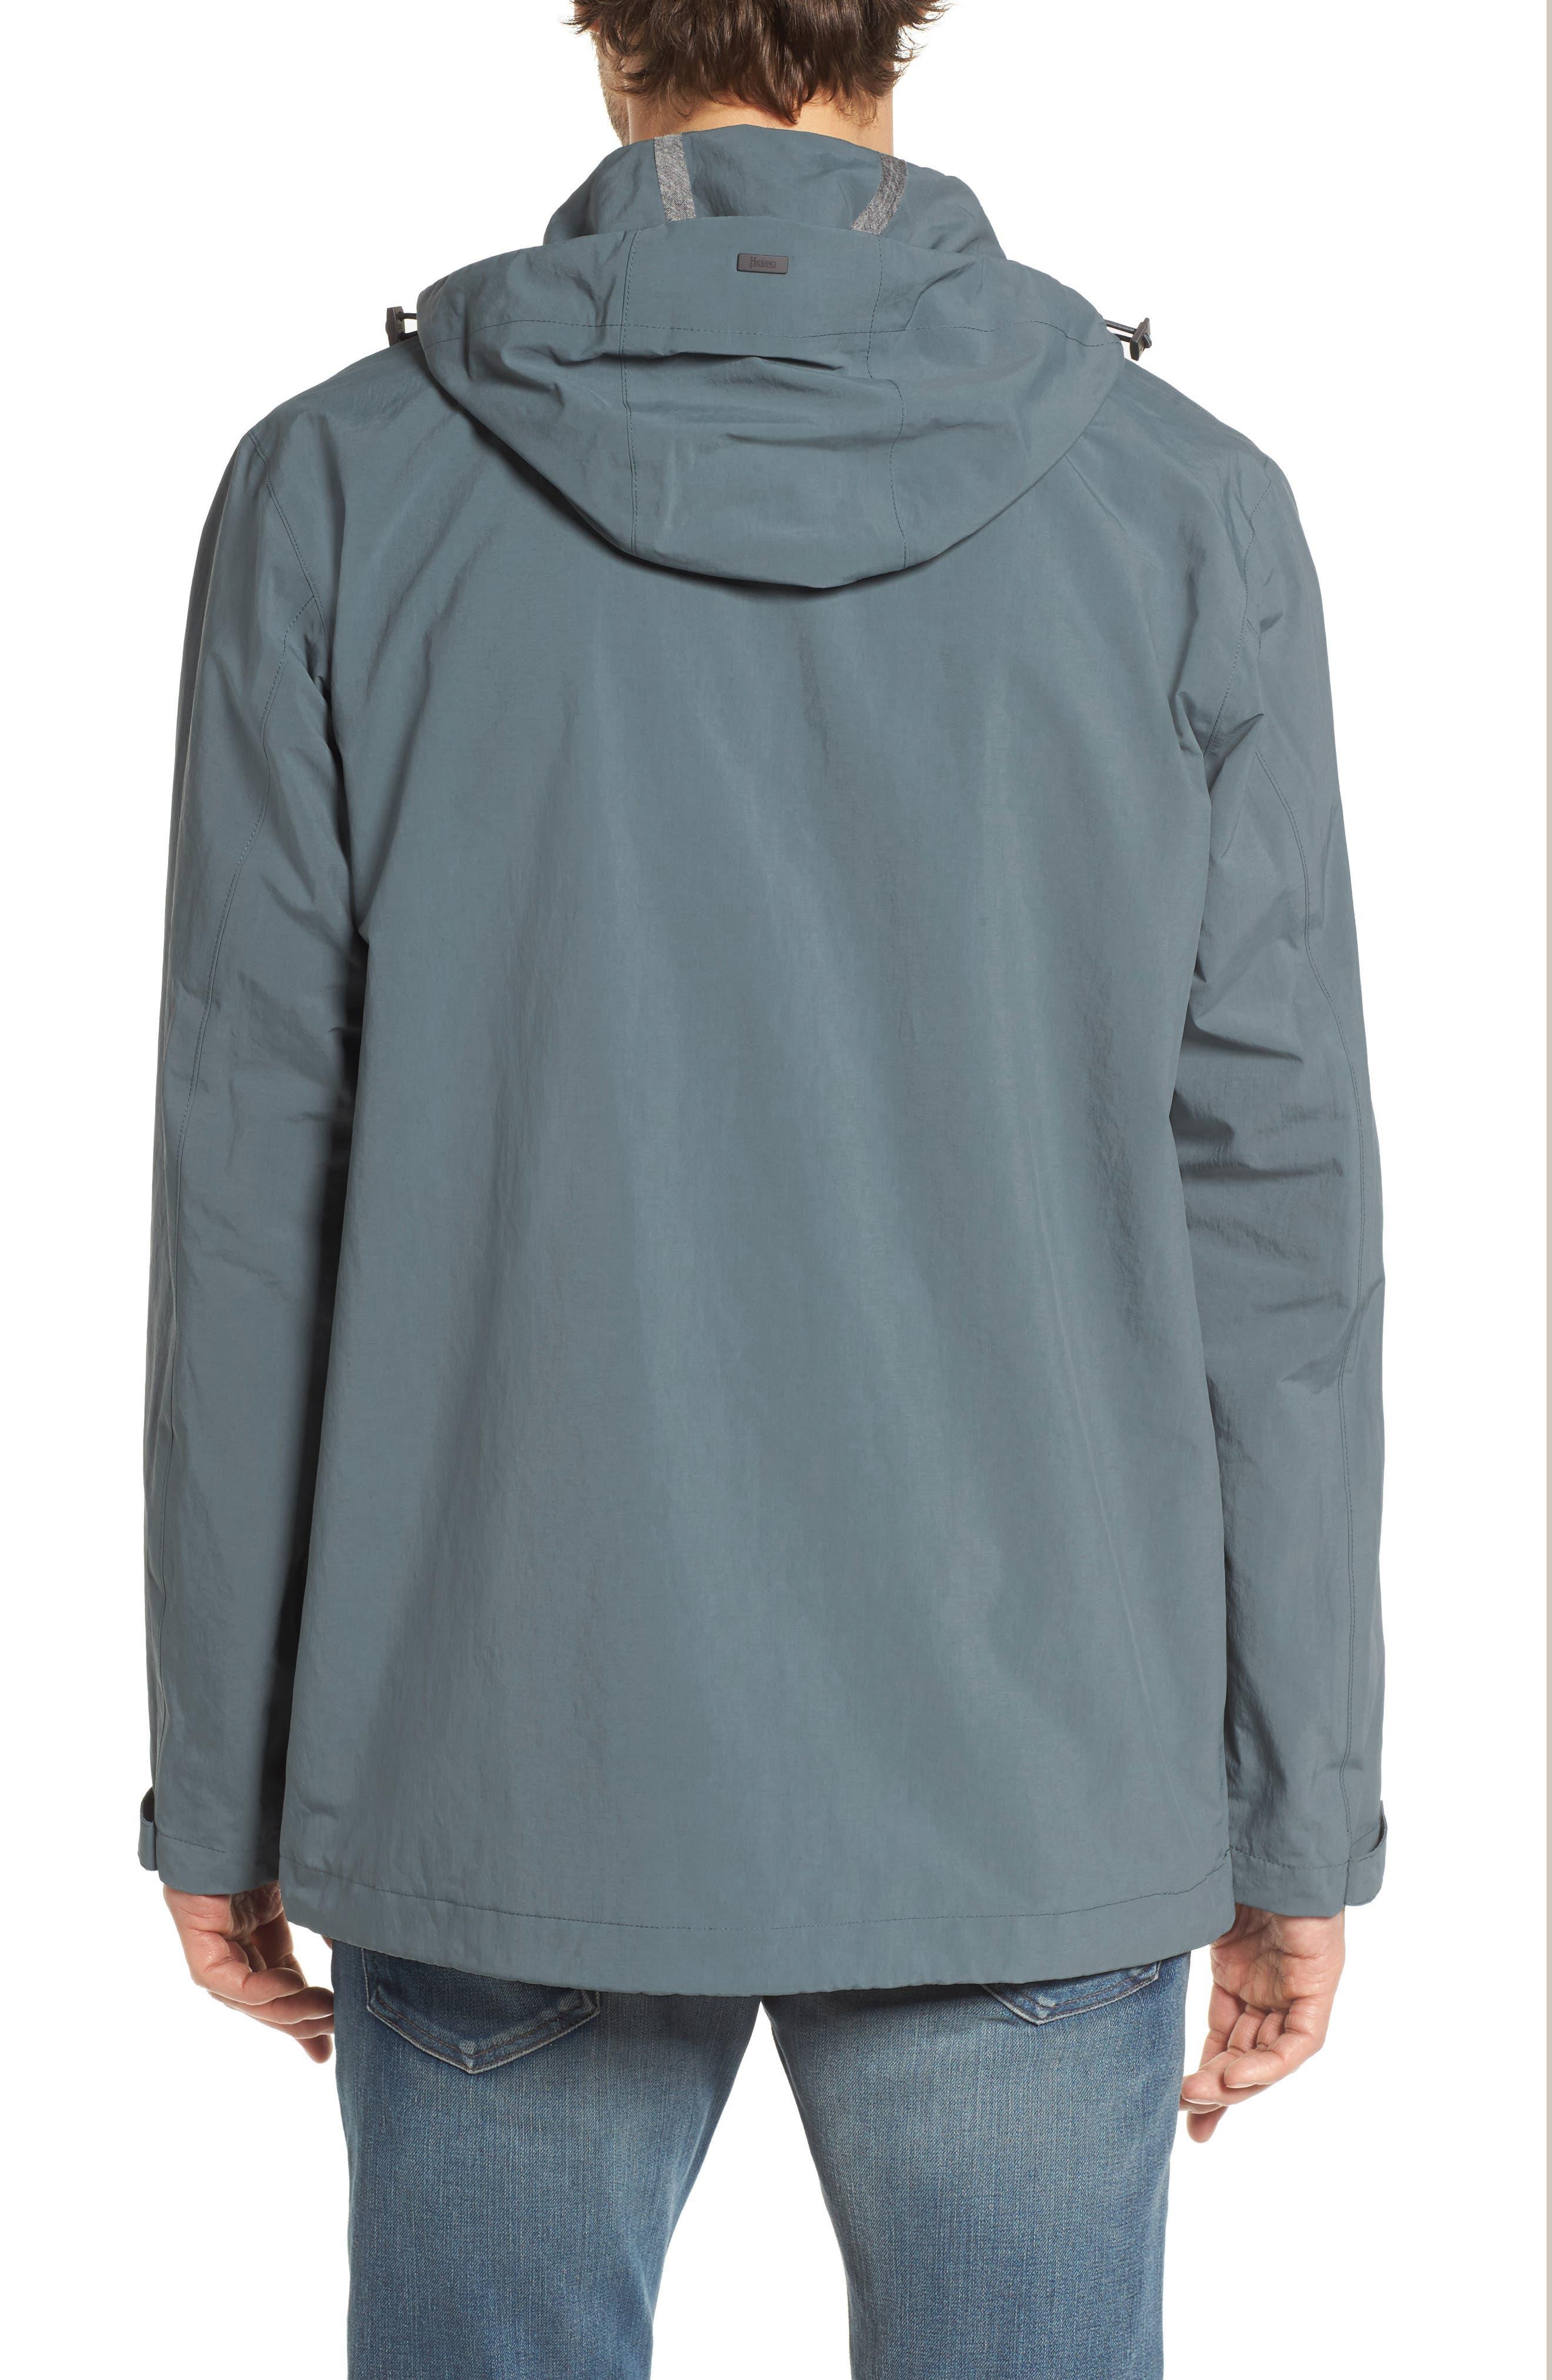 Plaster Hooded Raincoat,                             Alternate thumbnail 2, color,                             Blue/ Grey